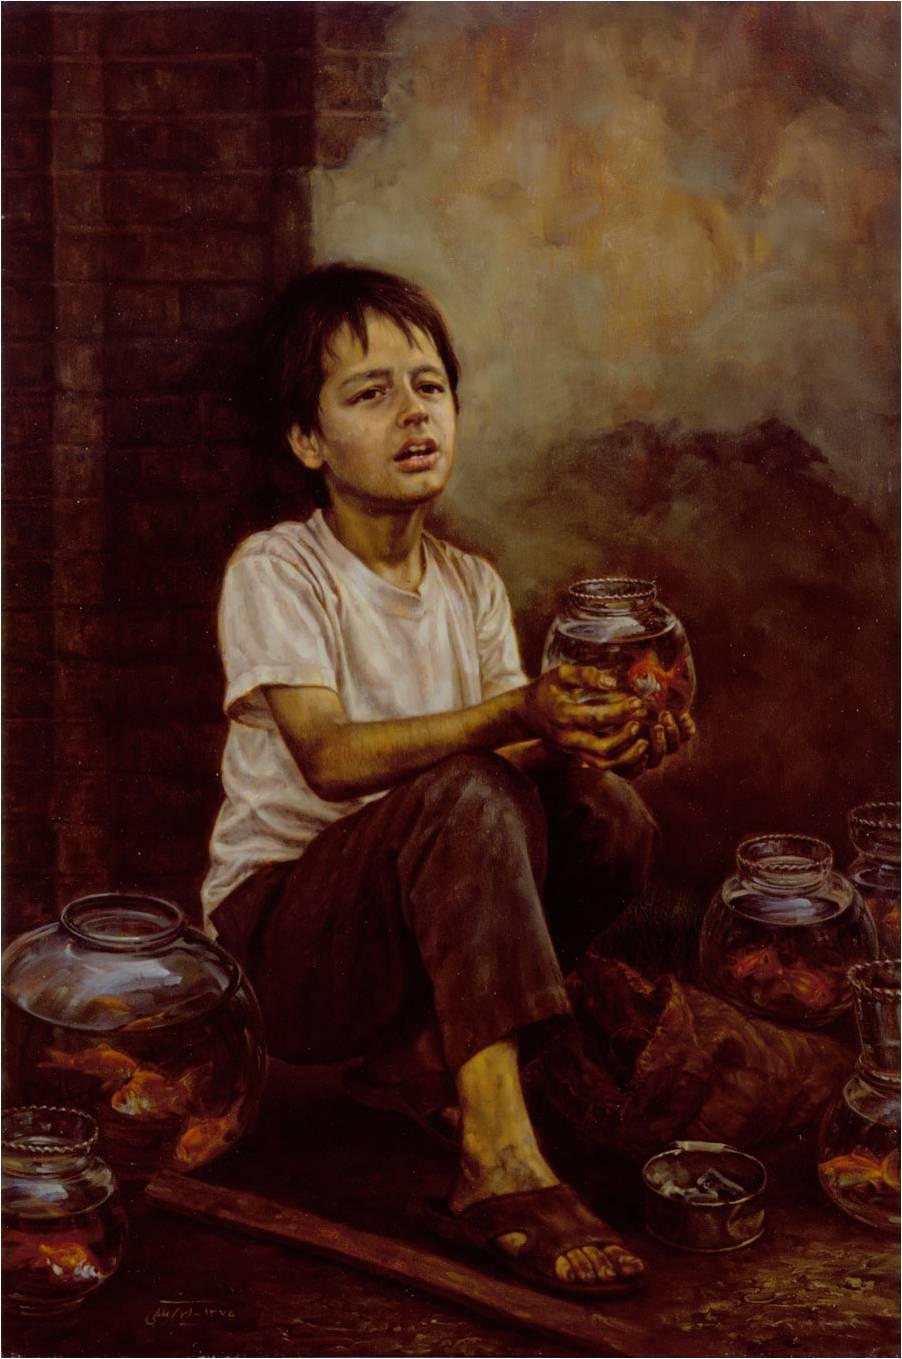 Iman Maleki - Impressionante arte 11